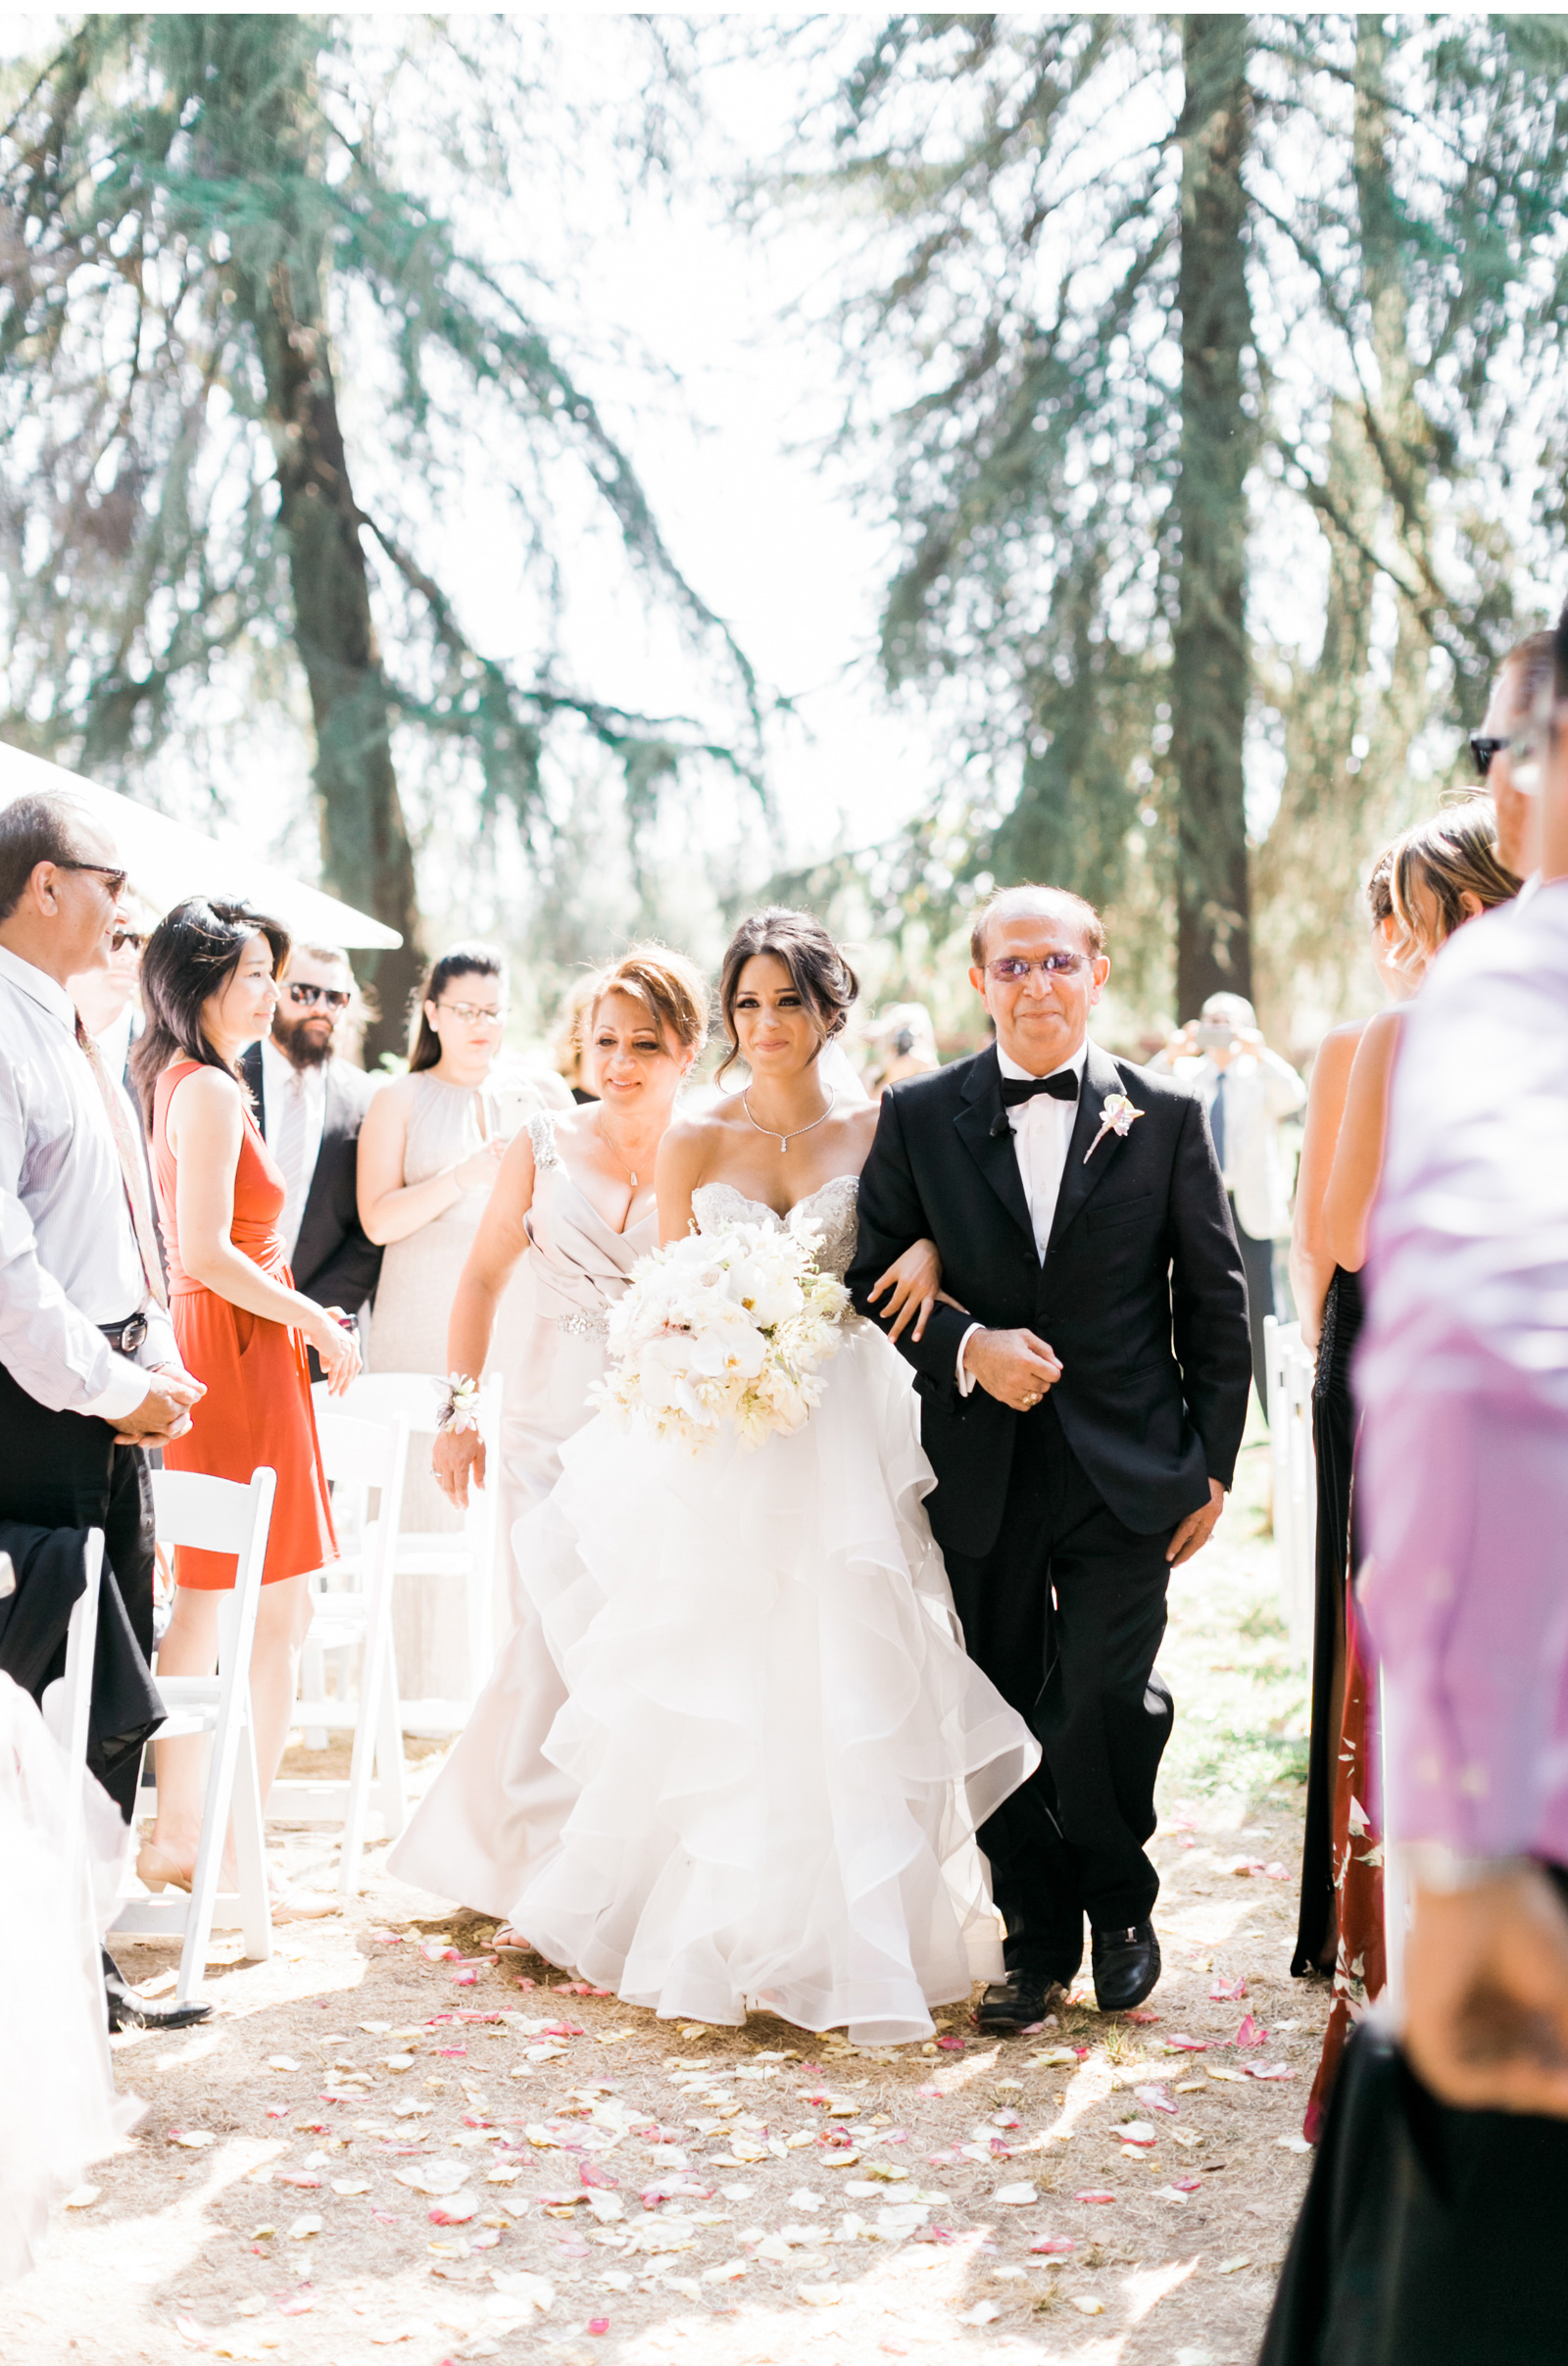 Style-Me-Pretty-Santa-Barbara-Wedding-Photographer-Natalie-Schutt-Photography_04.jpg